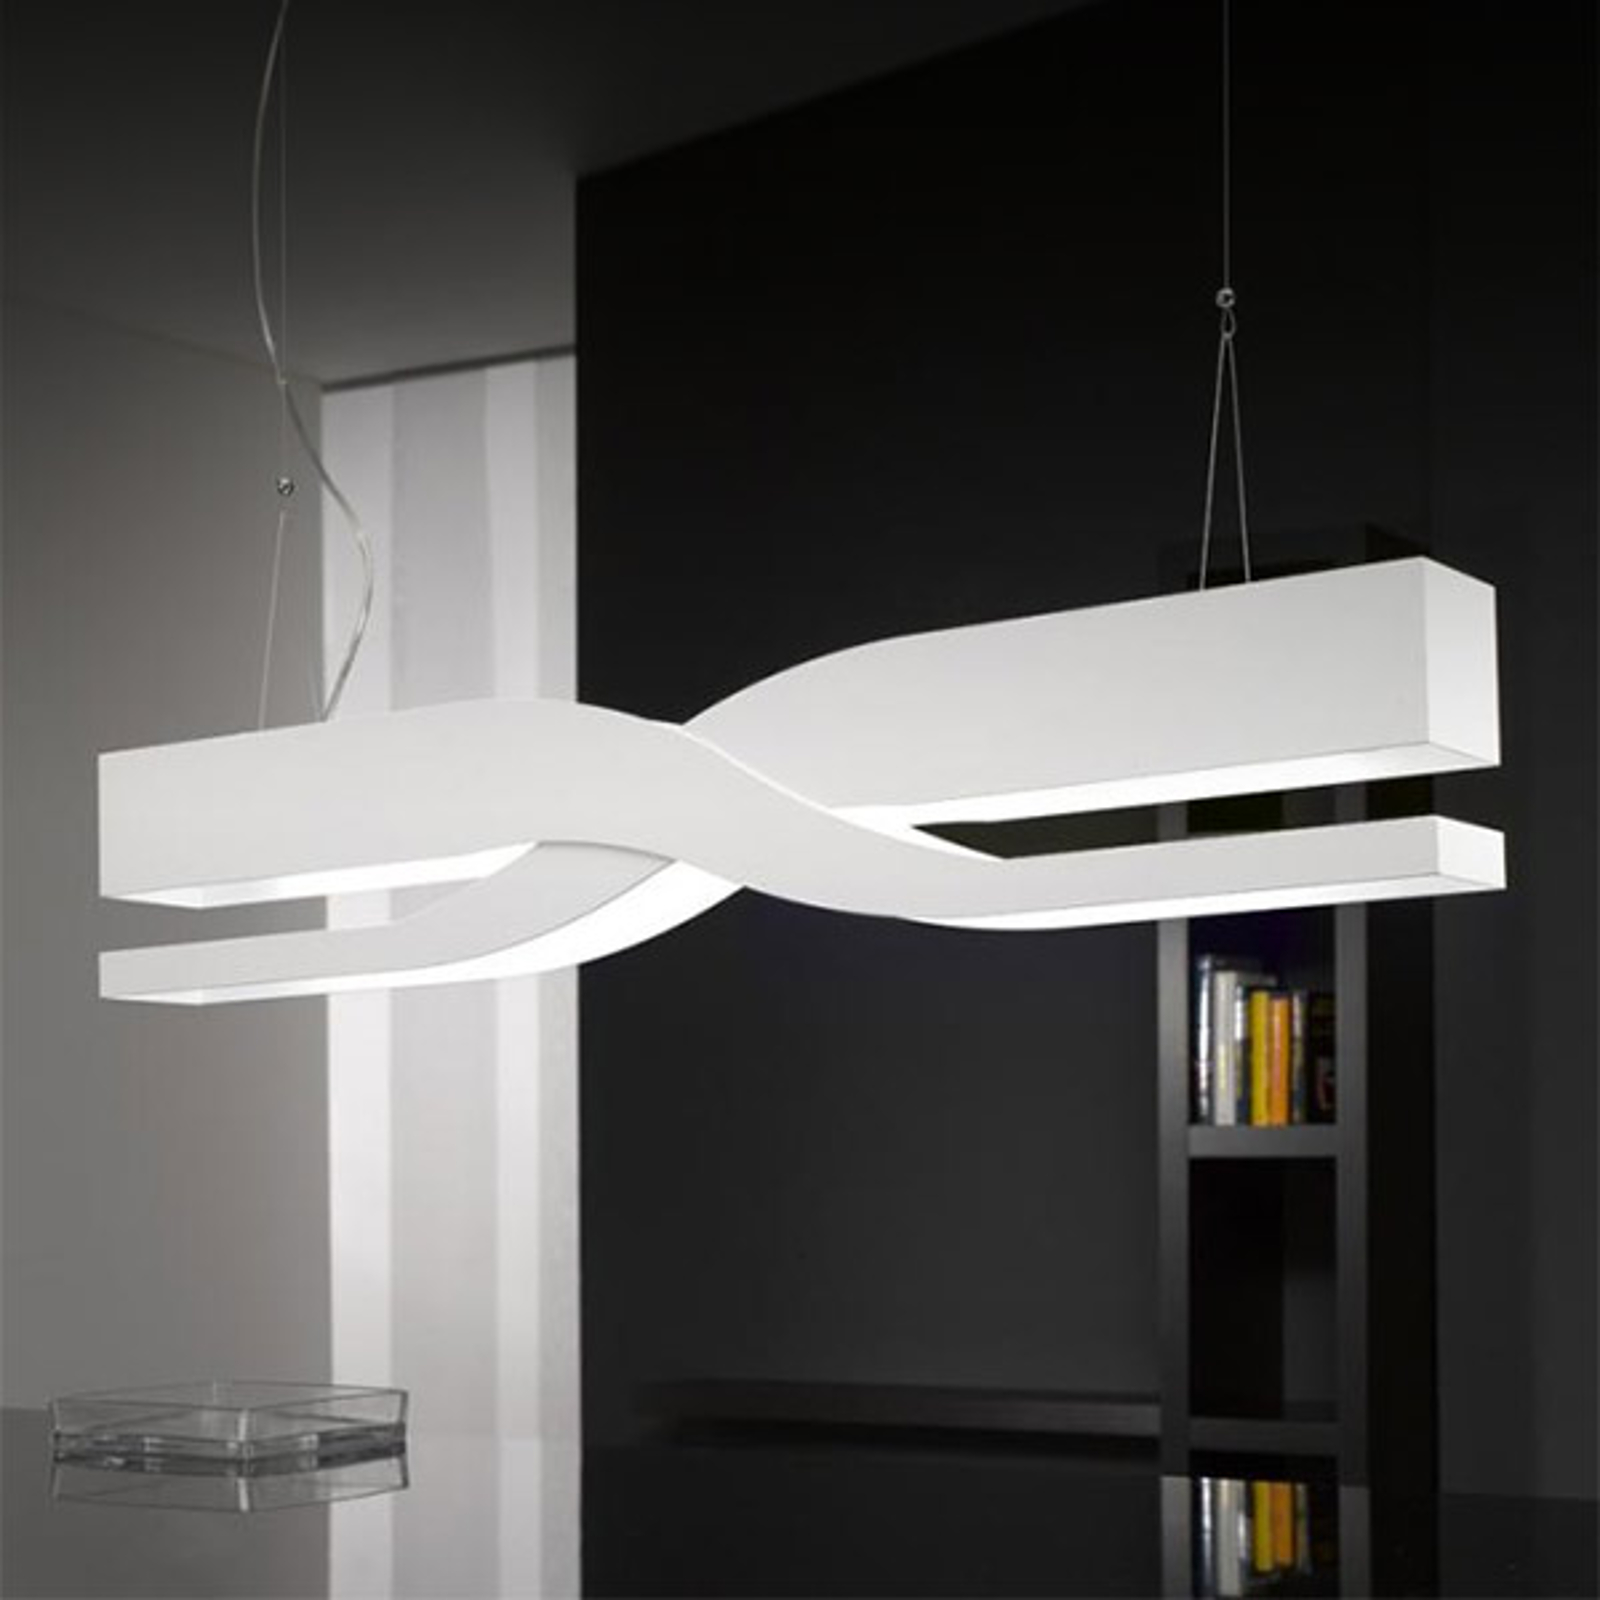 Biała designerska lampa wisząca Fifi 60 cm